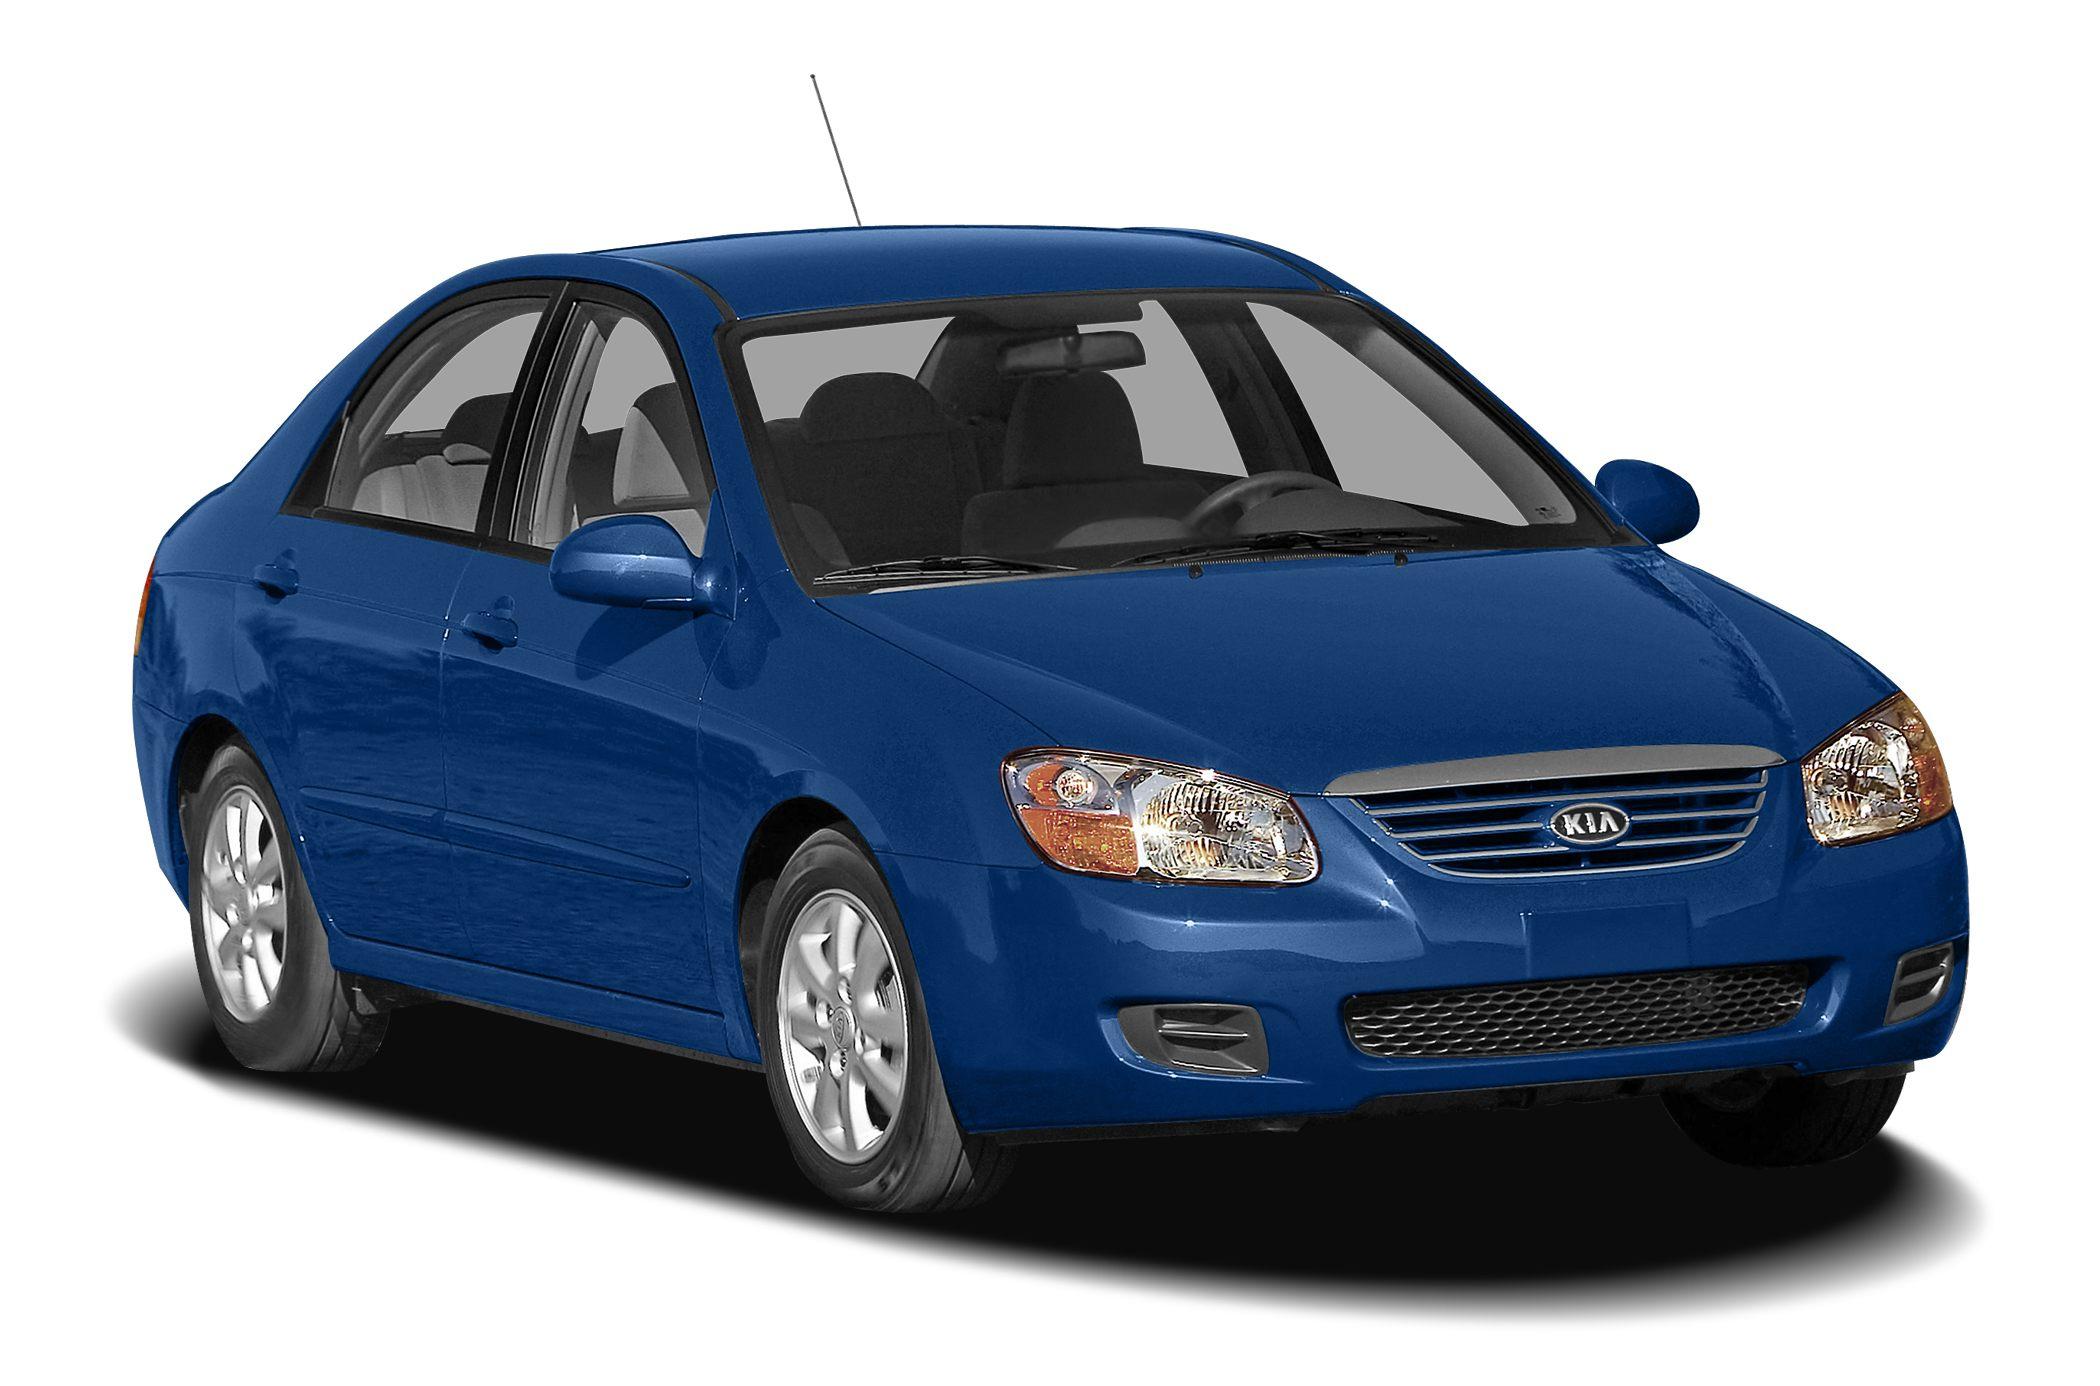 2009 kia spectra sedan owner owner's manual user guide lx ex sx.